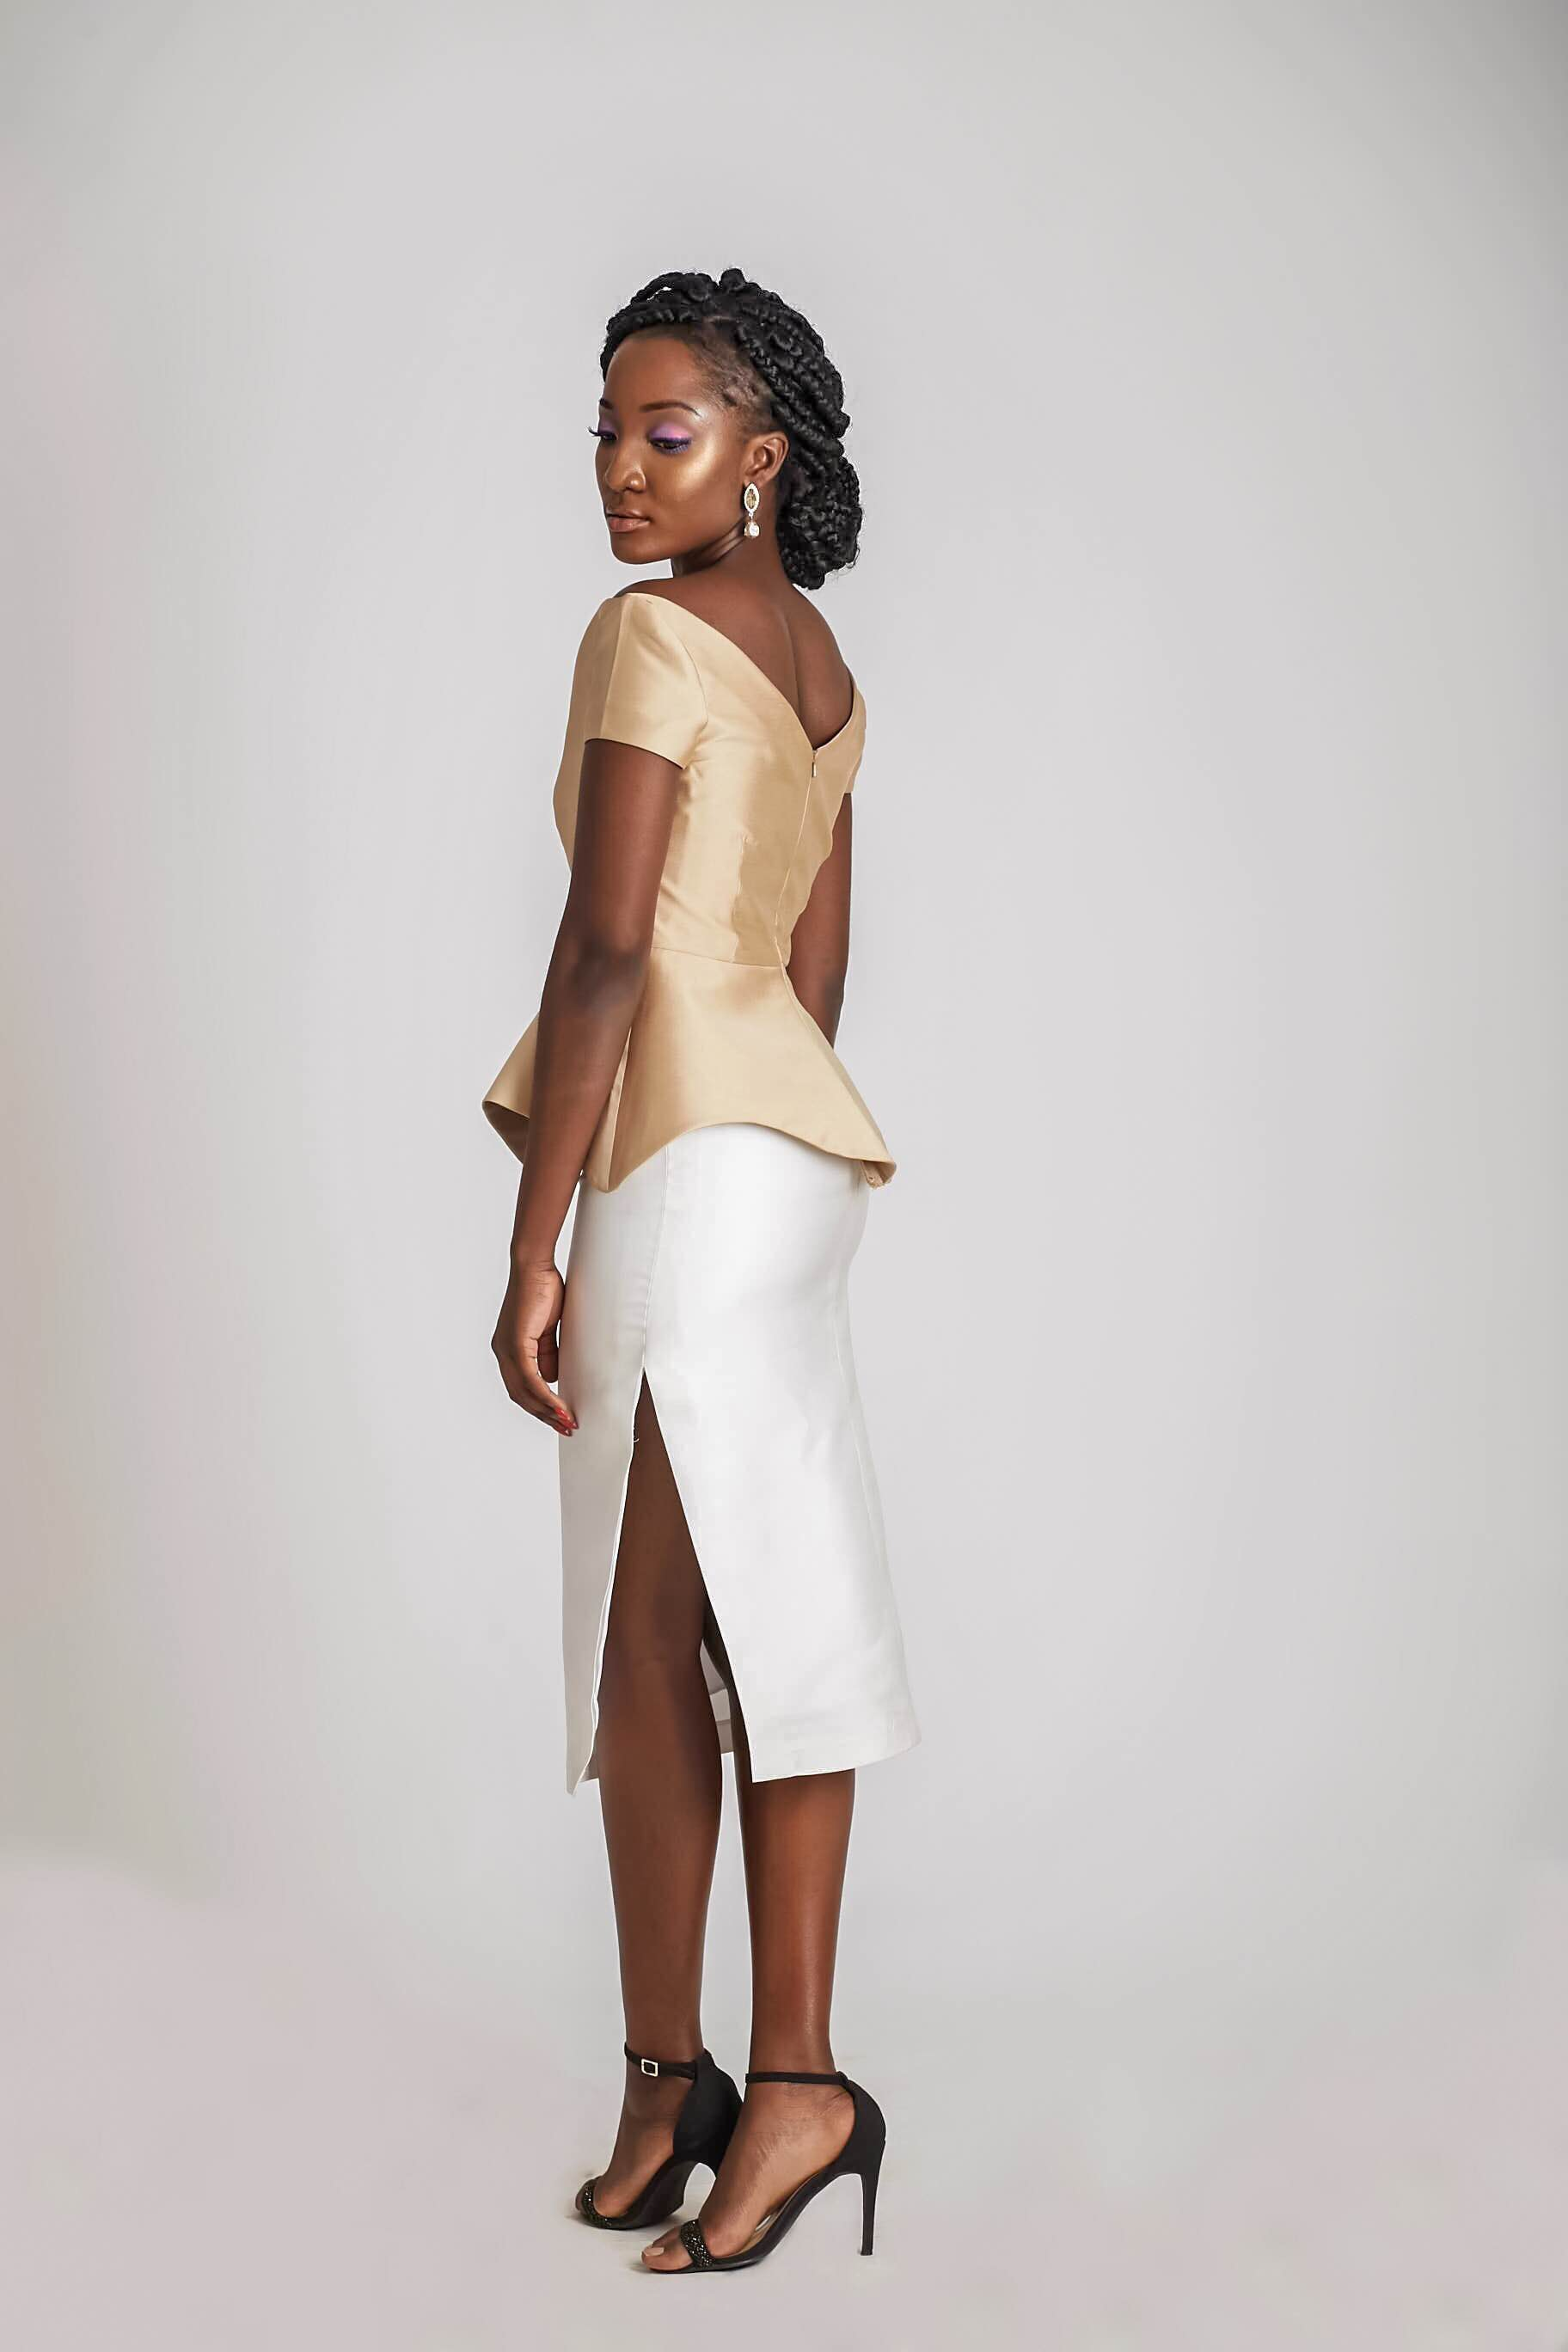 Imad Eduso - BN Style - Collection Lookbook - BellaNaija.com 014